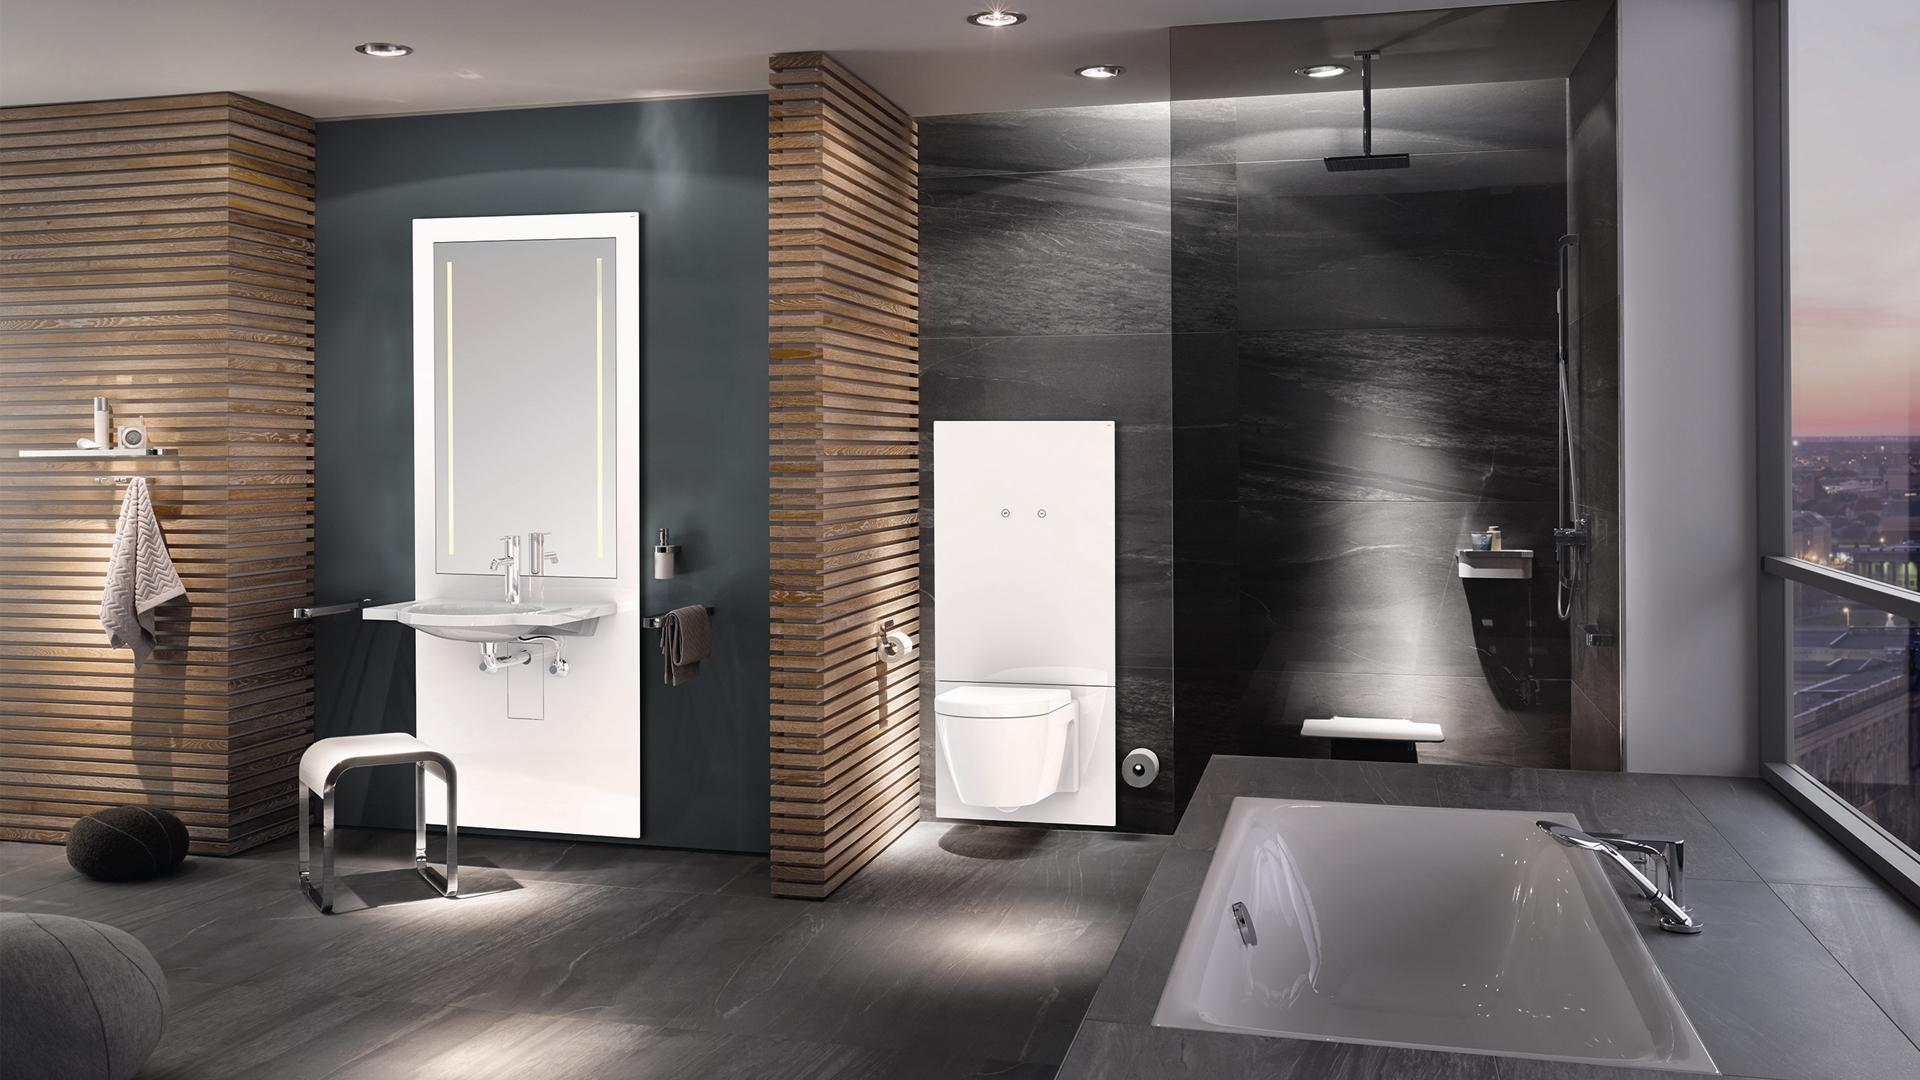 Bad raumgestaltung planwerk - Raumgestaltung badezimmer ...